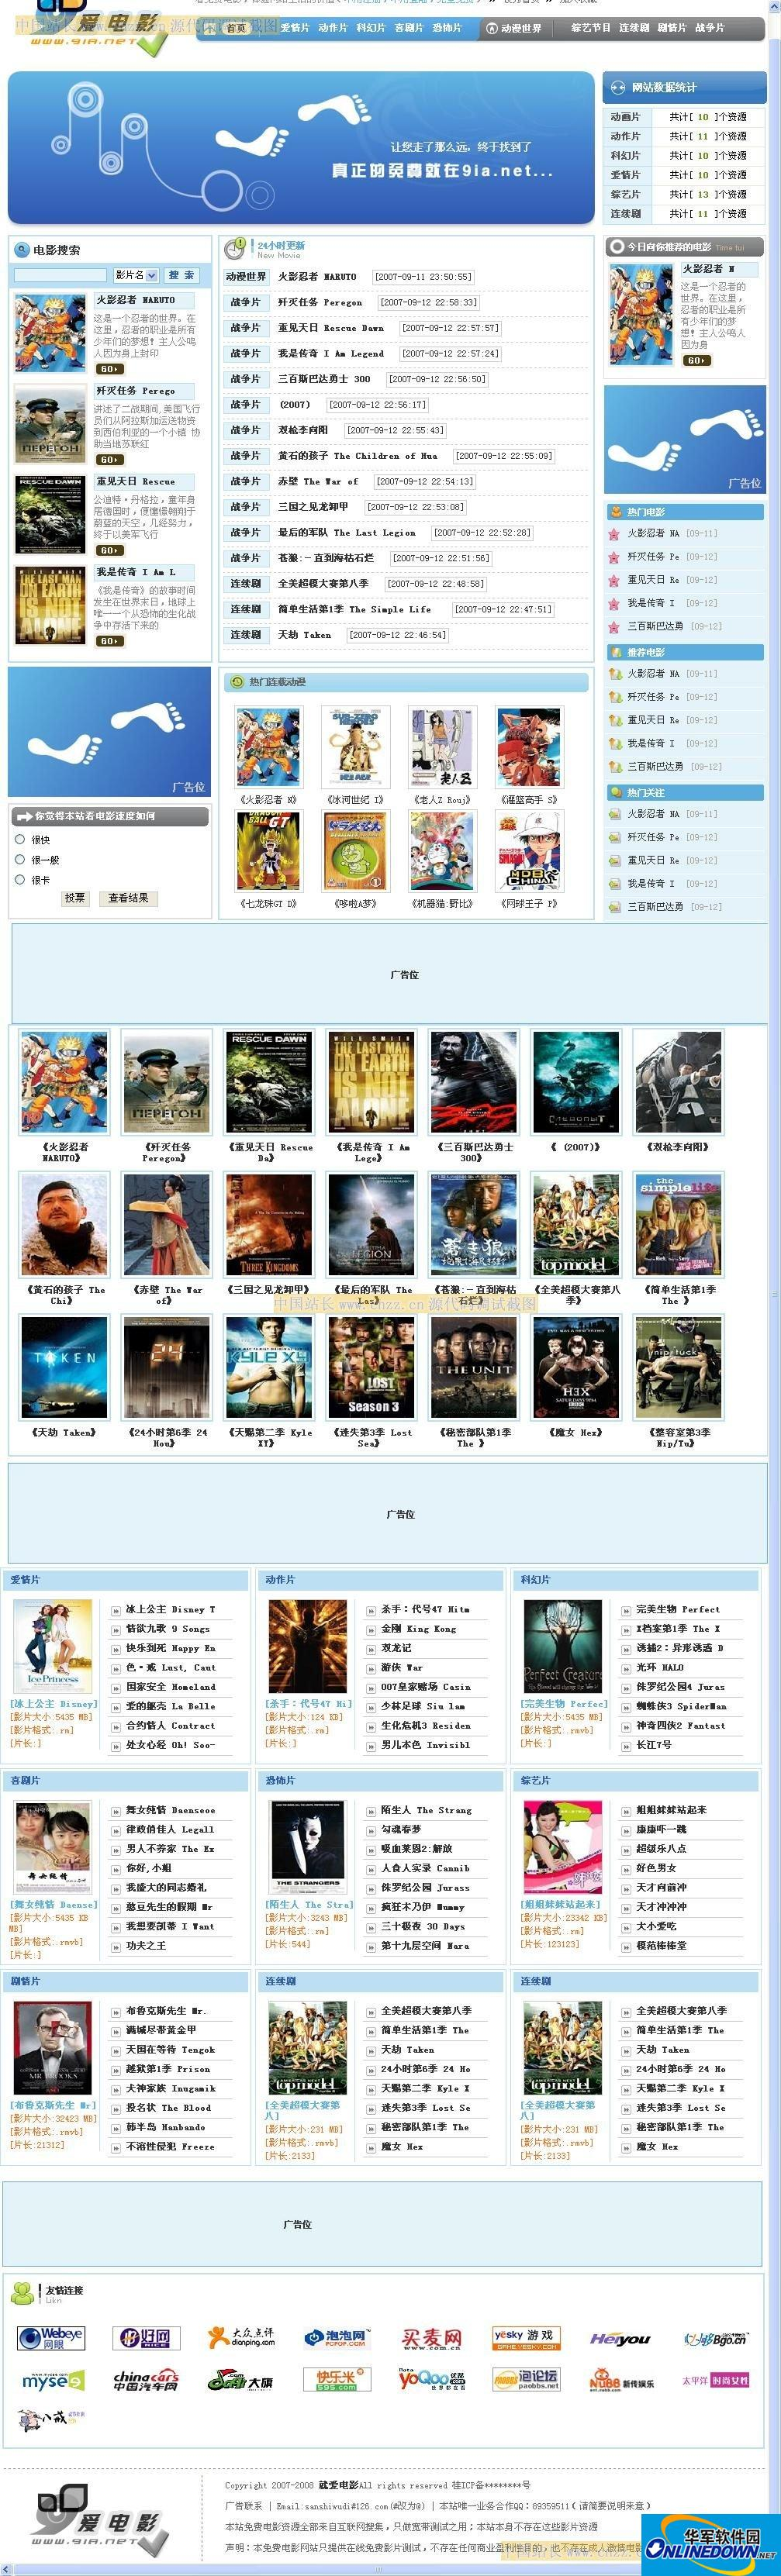 PHP+MYSQL的电影网站(DIV+CSS) PC版